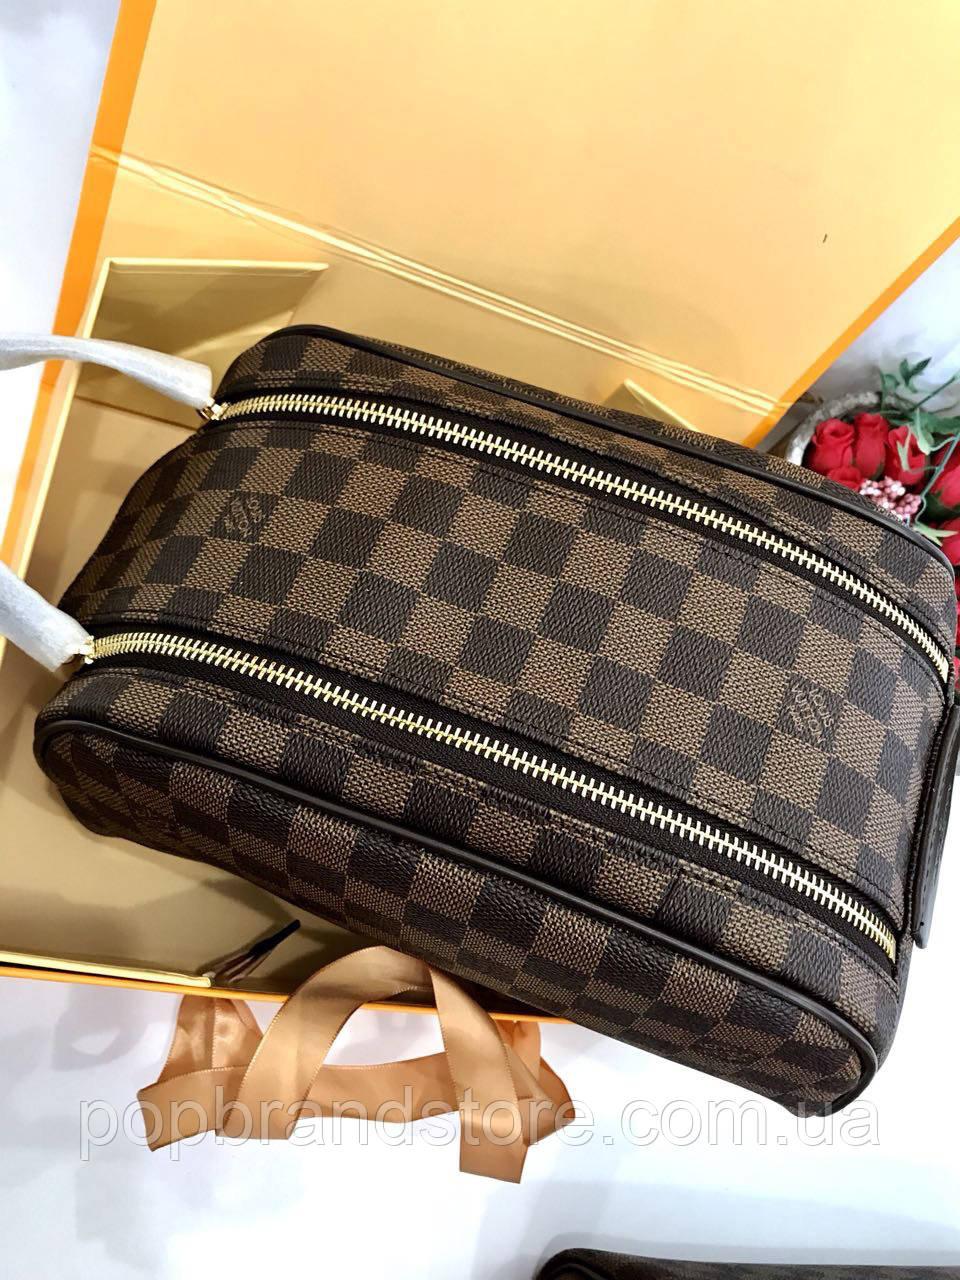 Косметичка Louis Vuitton Damier Canvas коричневая (реплика)  продажа ... 072c73d1fe2